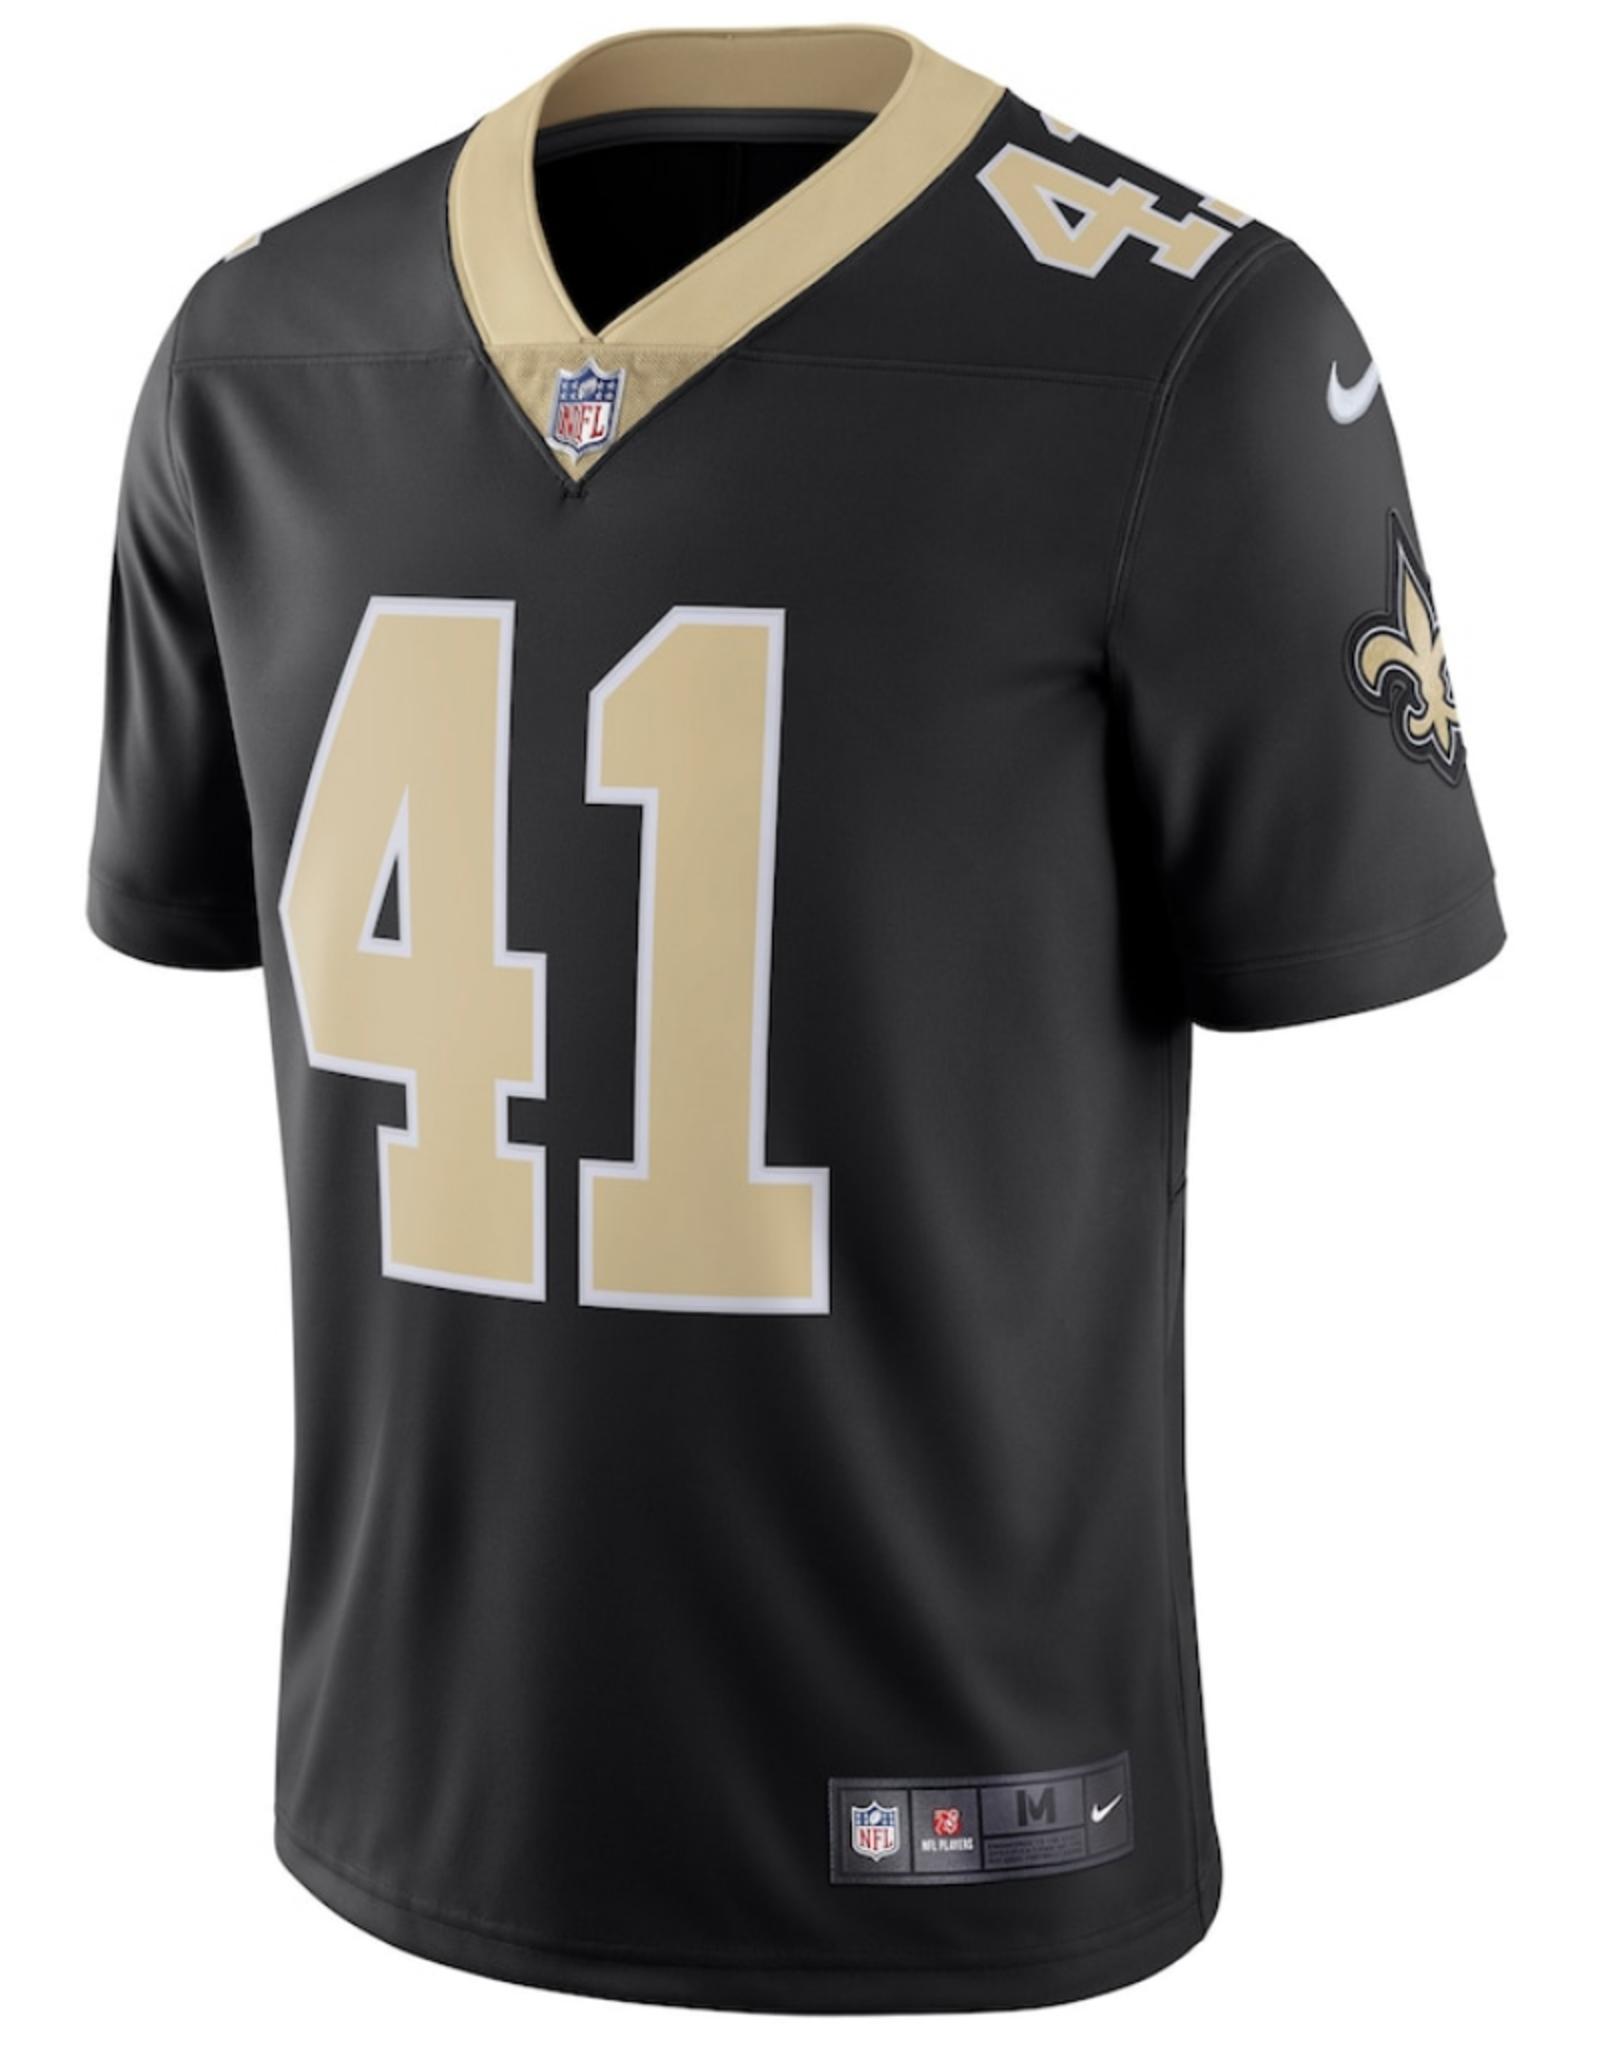 Nike Men's Limited Kamara #41 Jersey New Orleans Saints Black